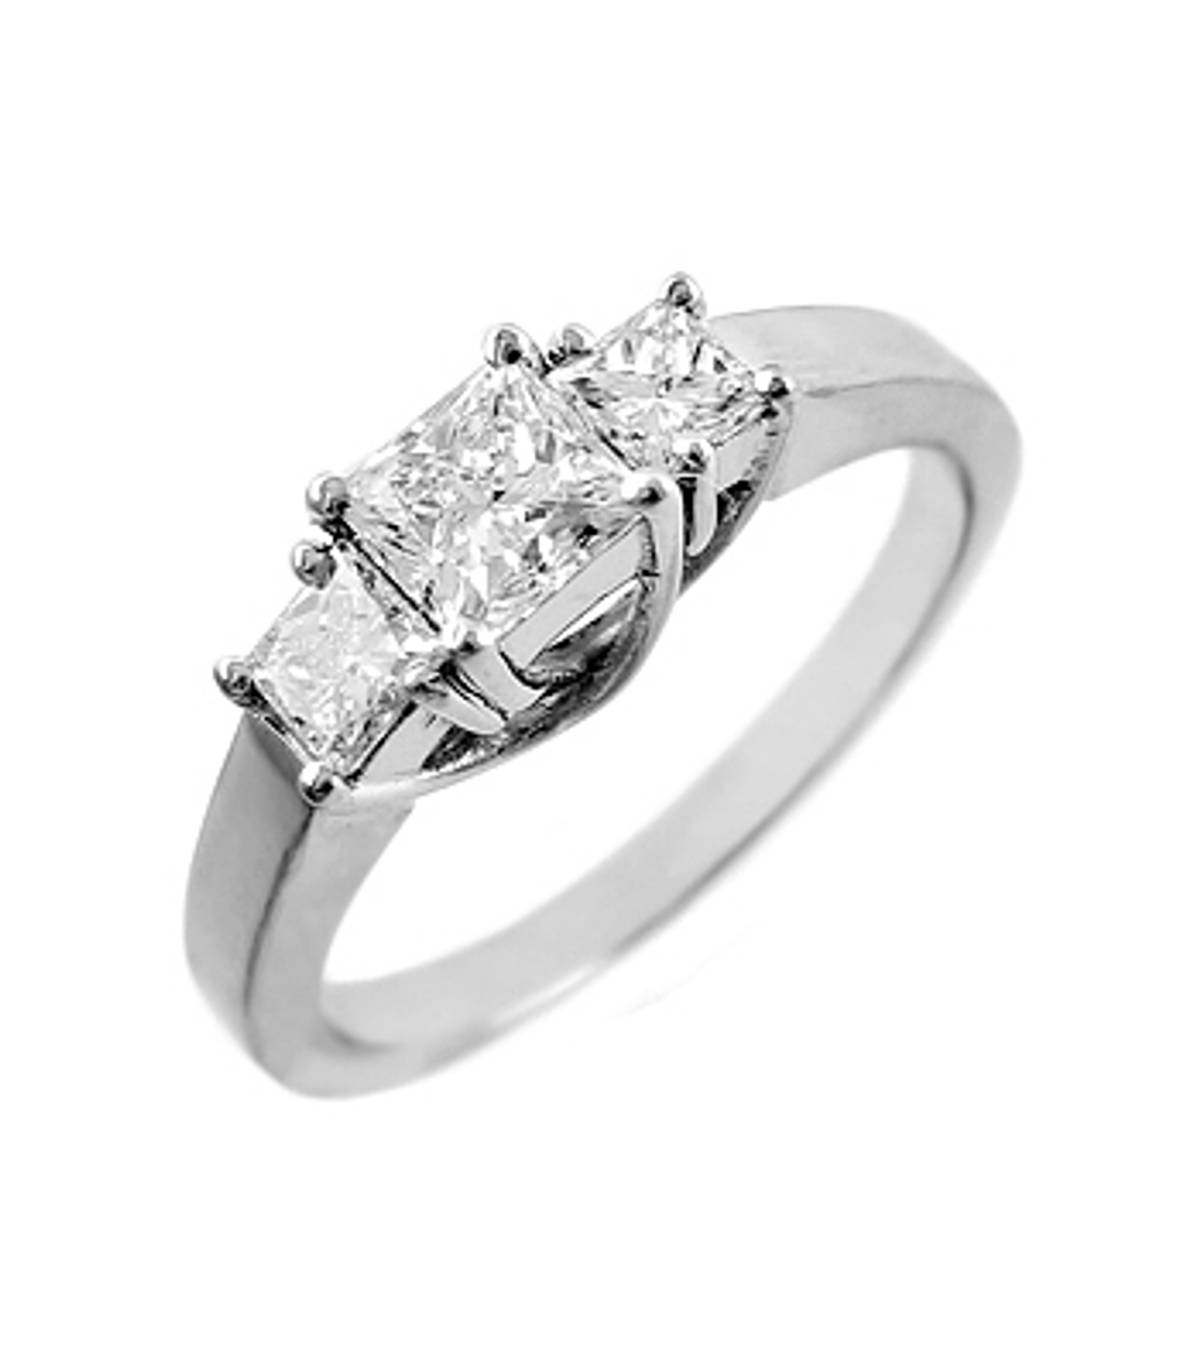 3 STONE DIAMOND RING 18k white gold 3st princess cut diamond ringDETAILSCarat: diamond total weight 0.80cts